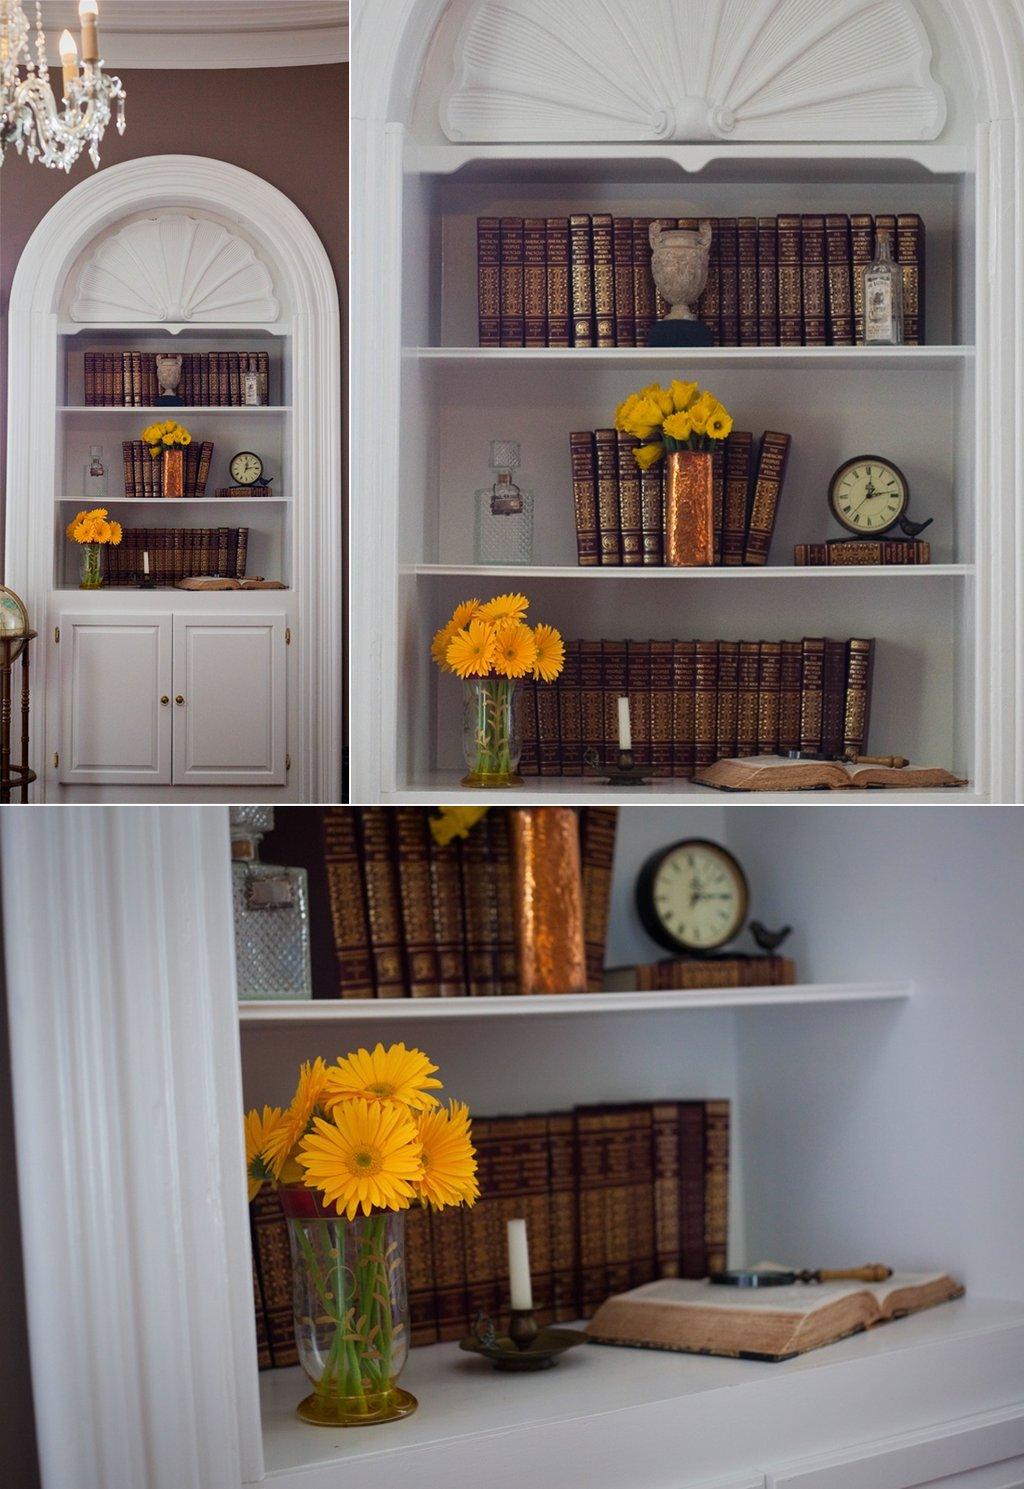 Vintage-wedding-reception-decor-bookshelf-at-wedding-venue-yellow-wedding-flowers.full